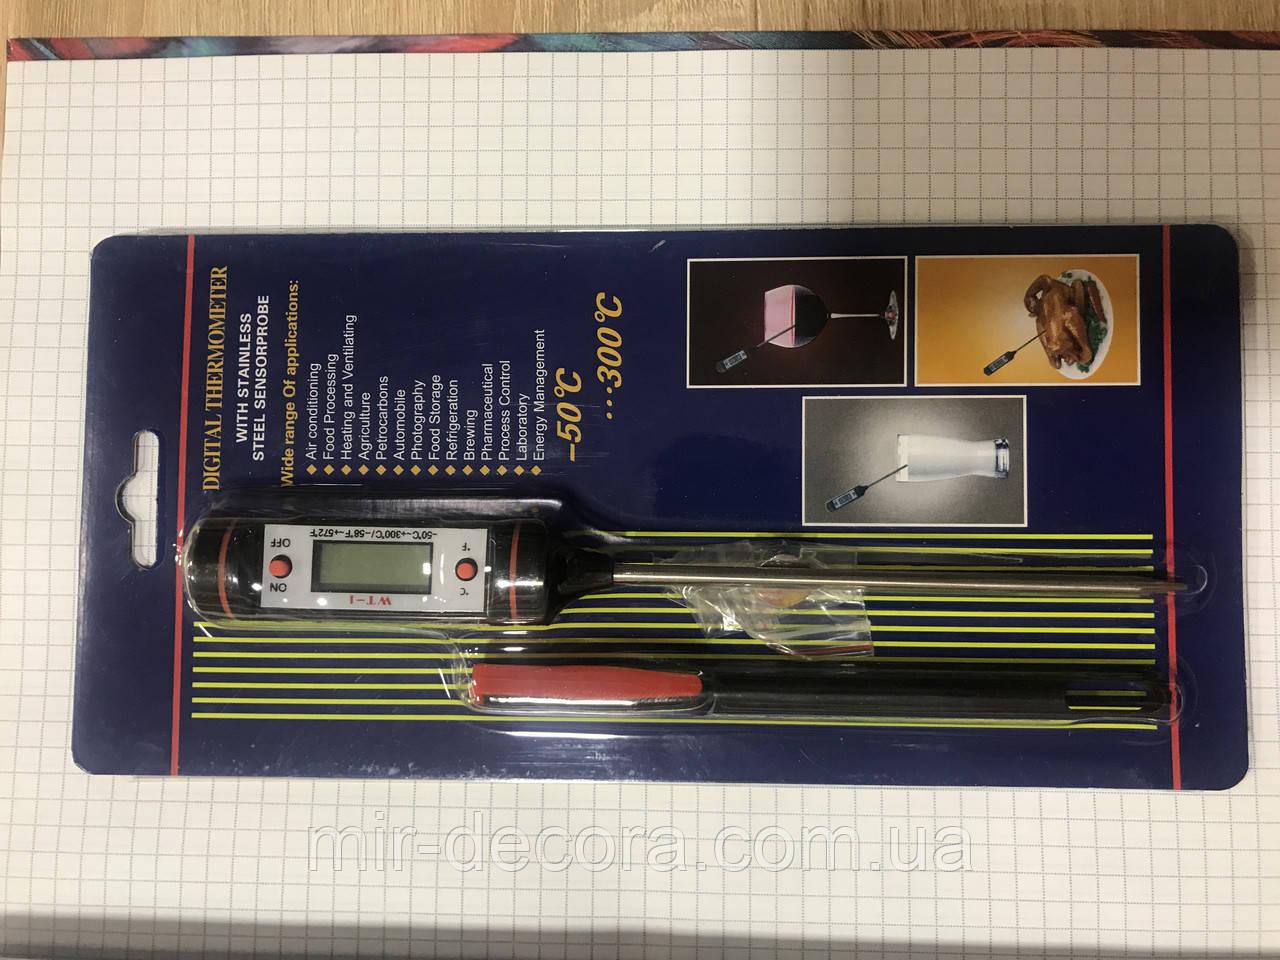 Термометр кулинарный цифровой -50 до +300